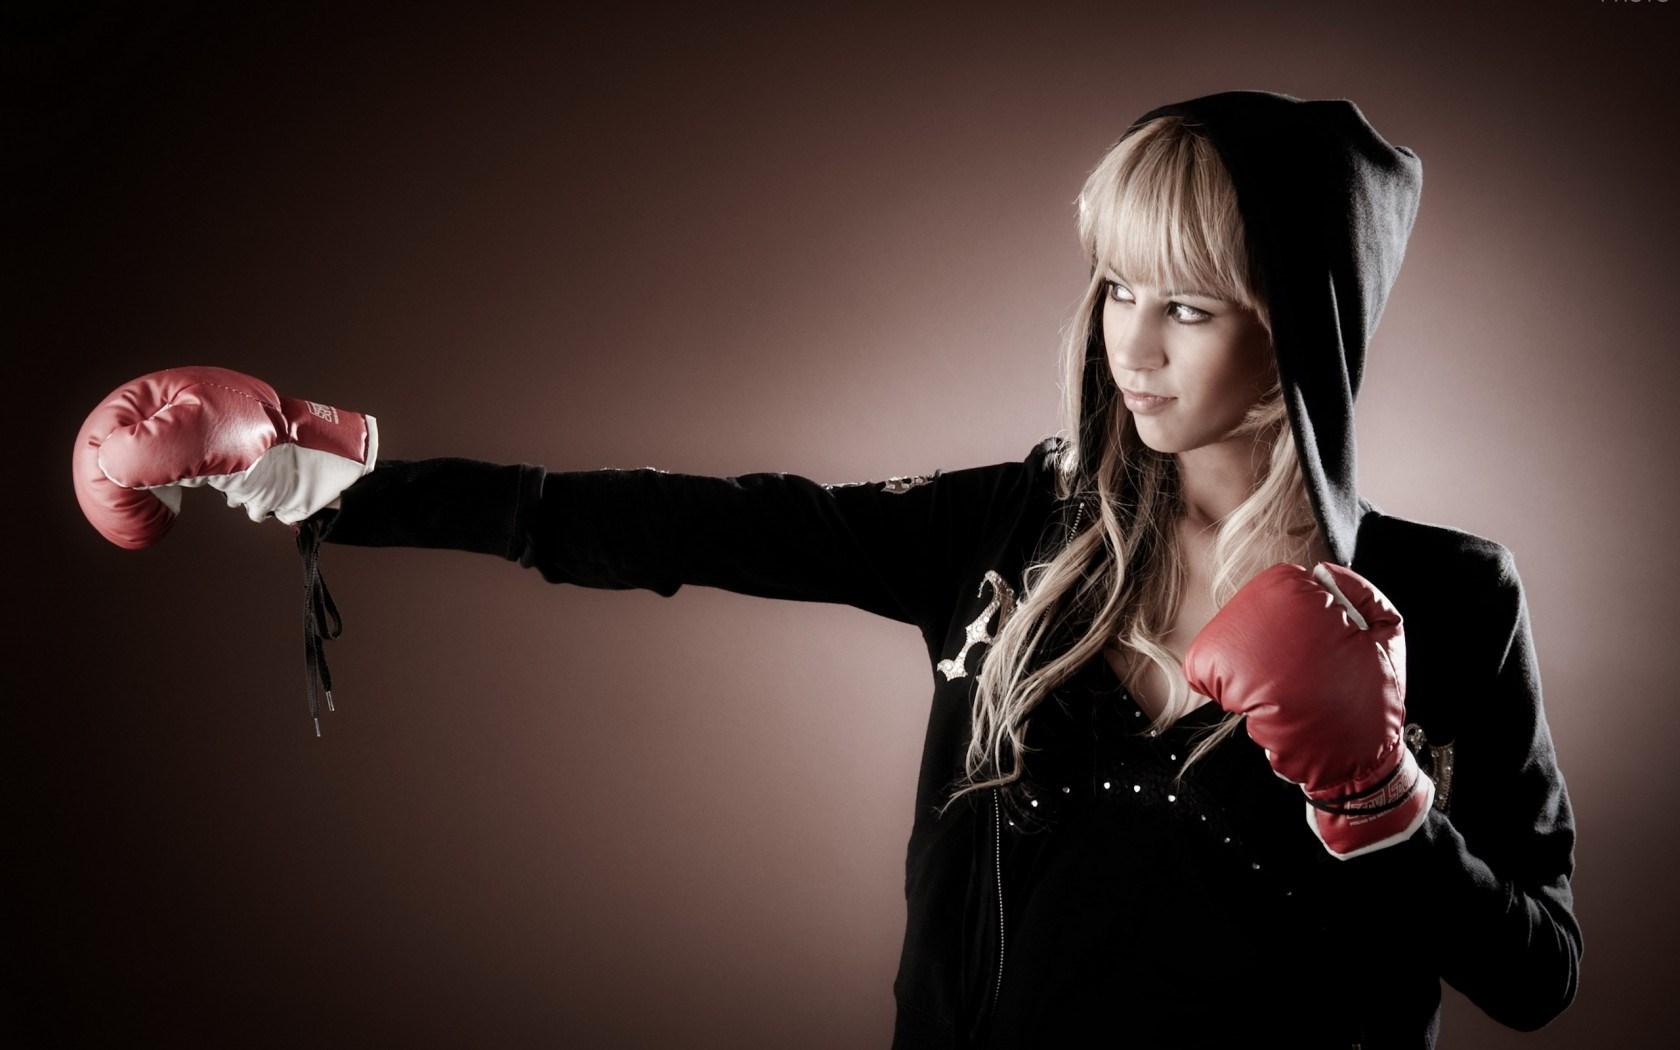 Ekurzy karate, sebeobrany a motivace